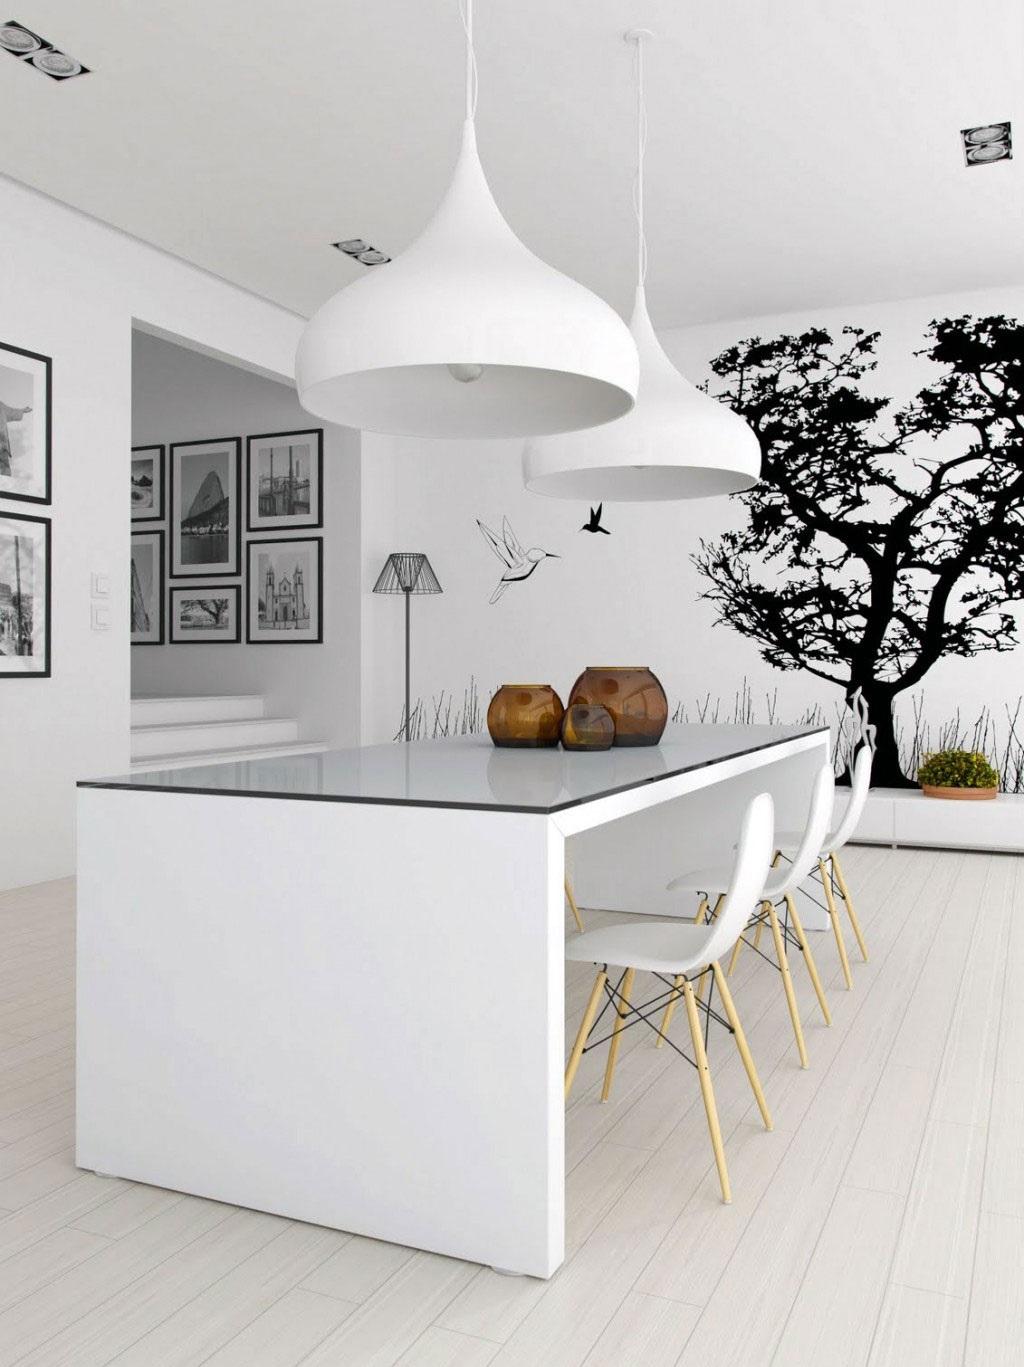 Creative Wall Art ideas | Do it yourself ideas and projects on Creative Wall Decor Ideas  id=59462